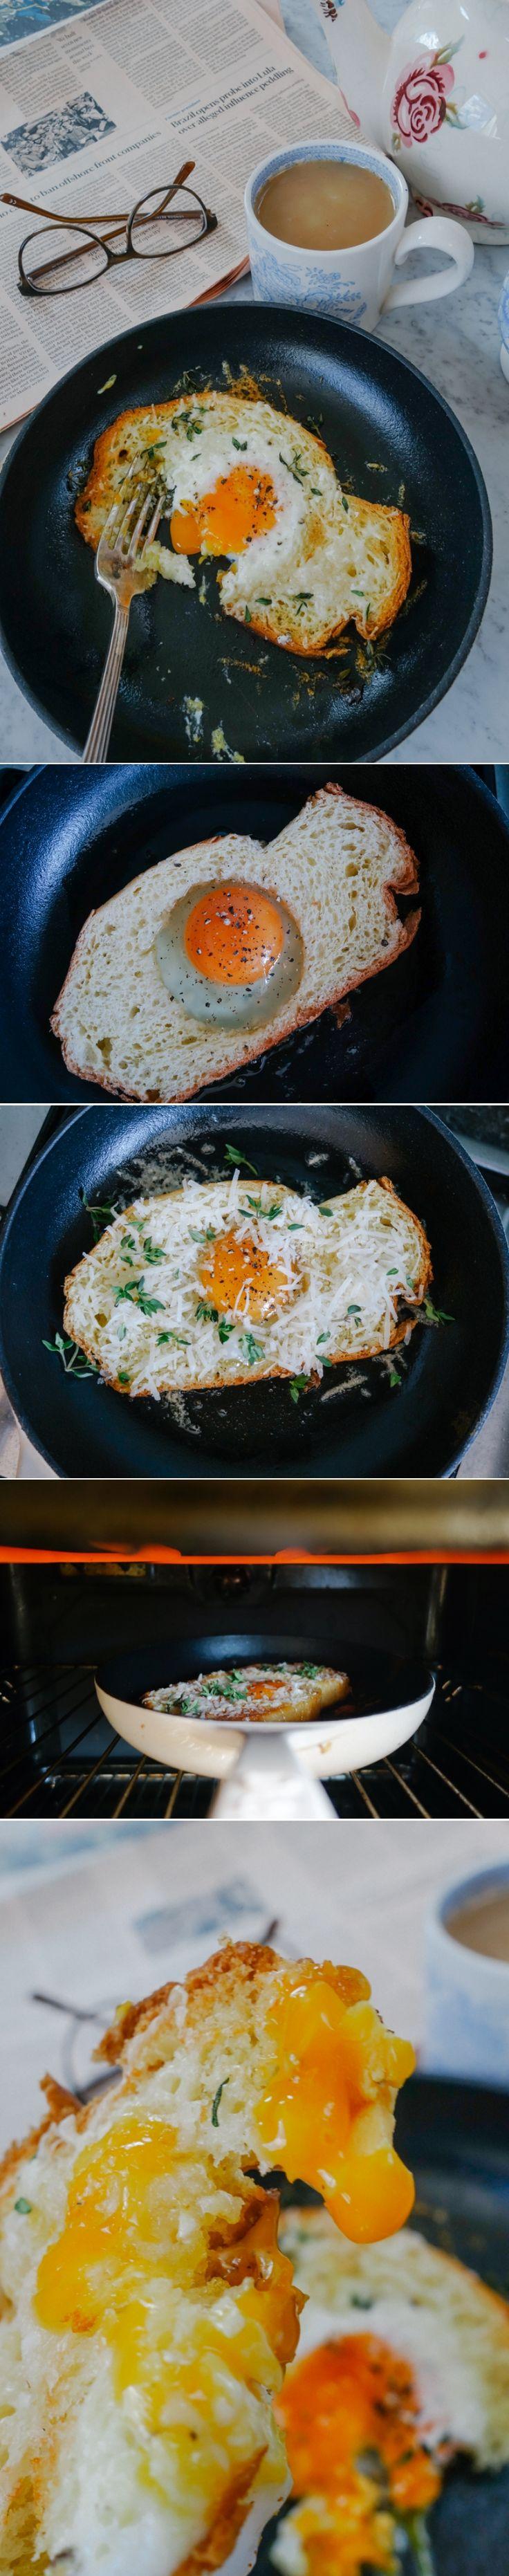 #Truffle & #Parmesan #Egg in Brioche - The Londoner